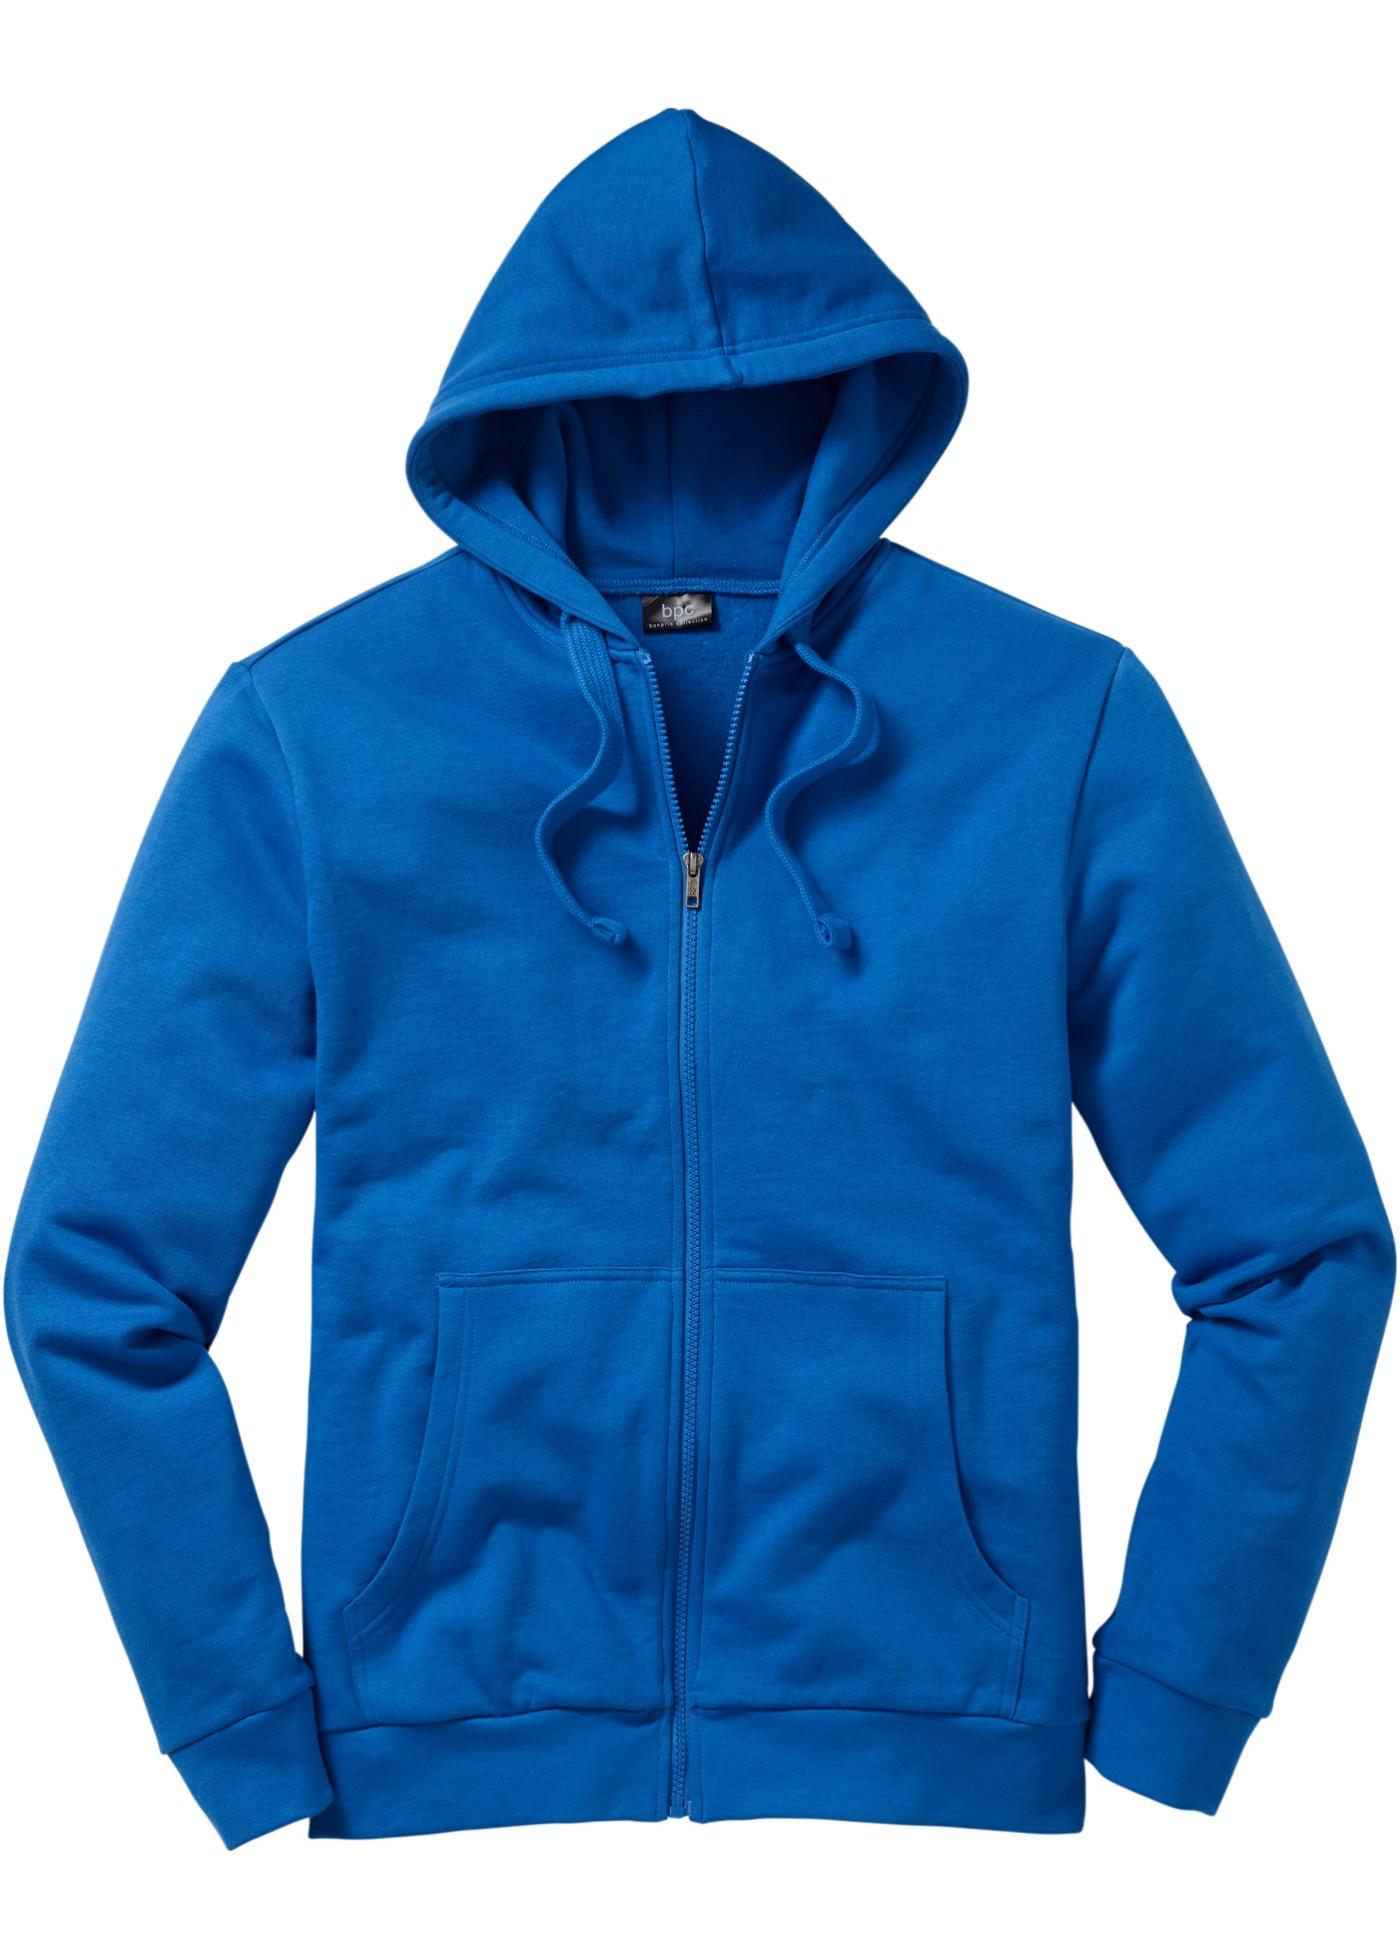 Gilet sweat-shirt à capuche Regular Fit